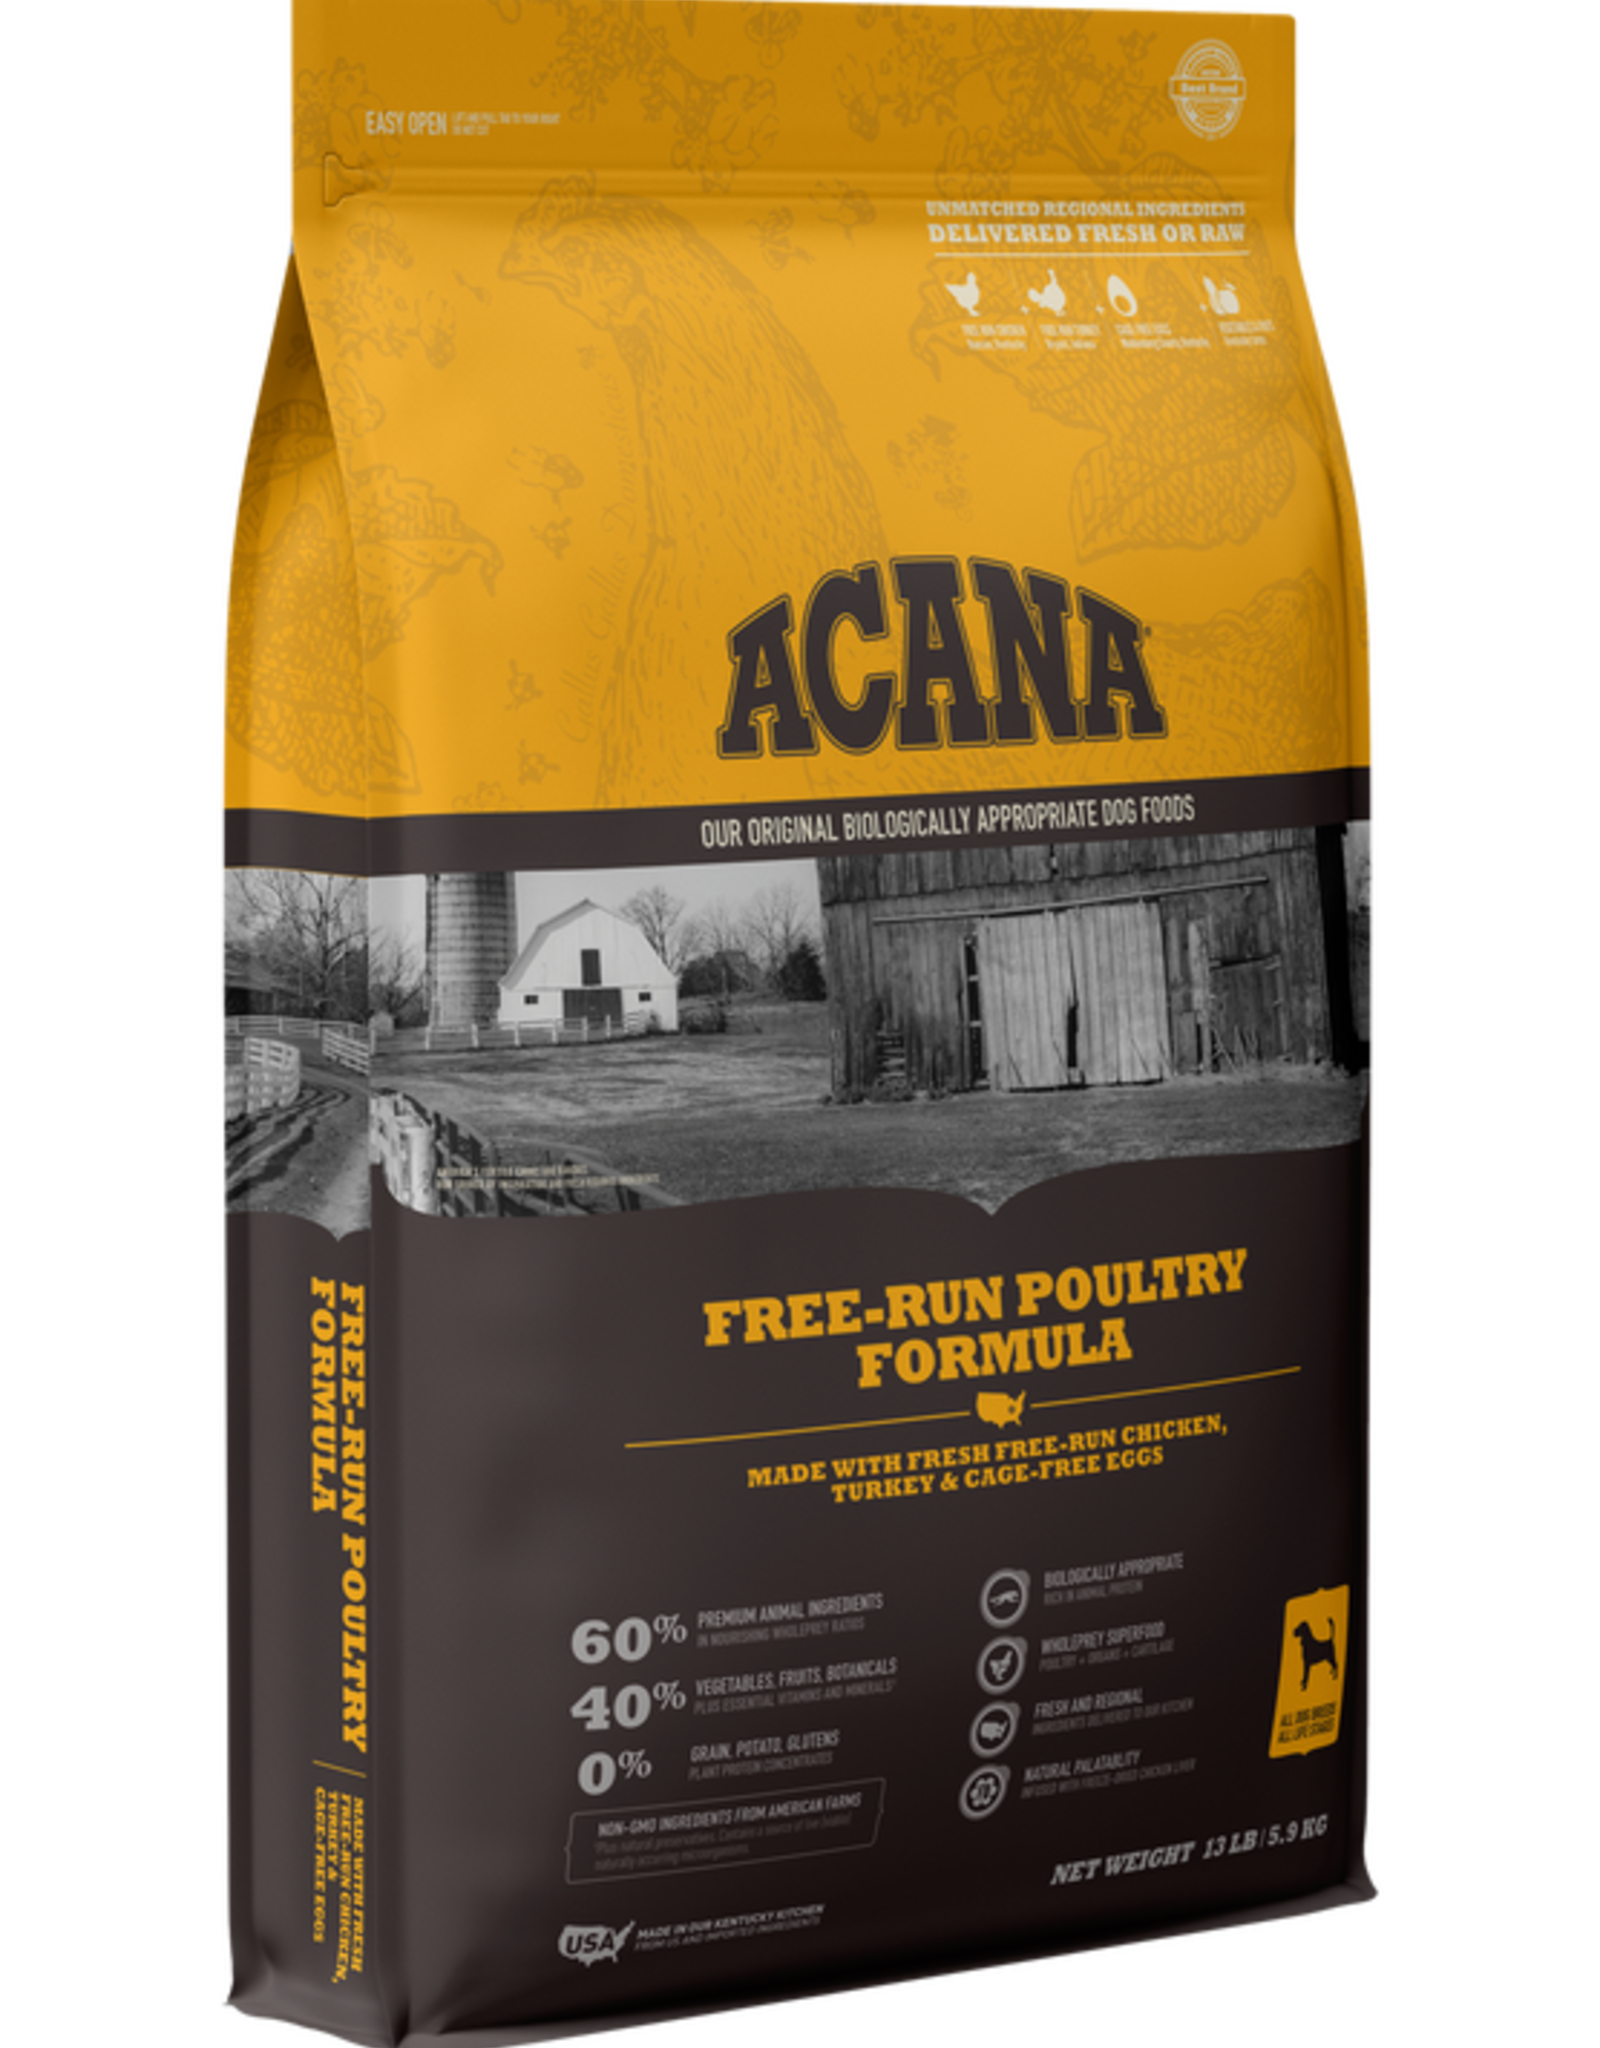 Acana Dog Heritage Free-Run Poultry - Grain-Free 4.5lb